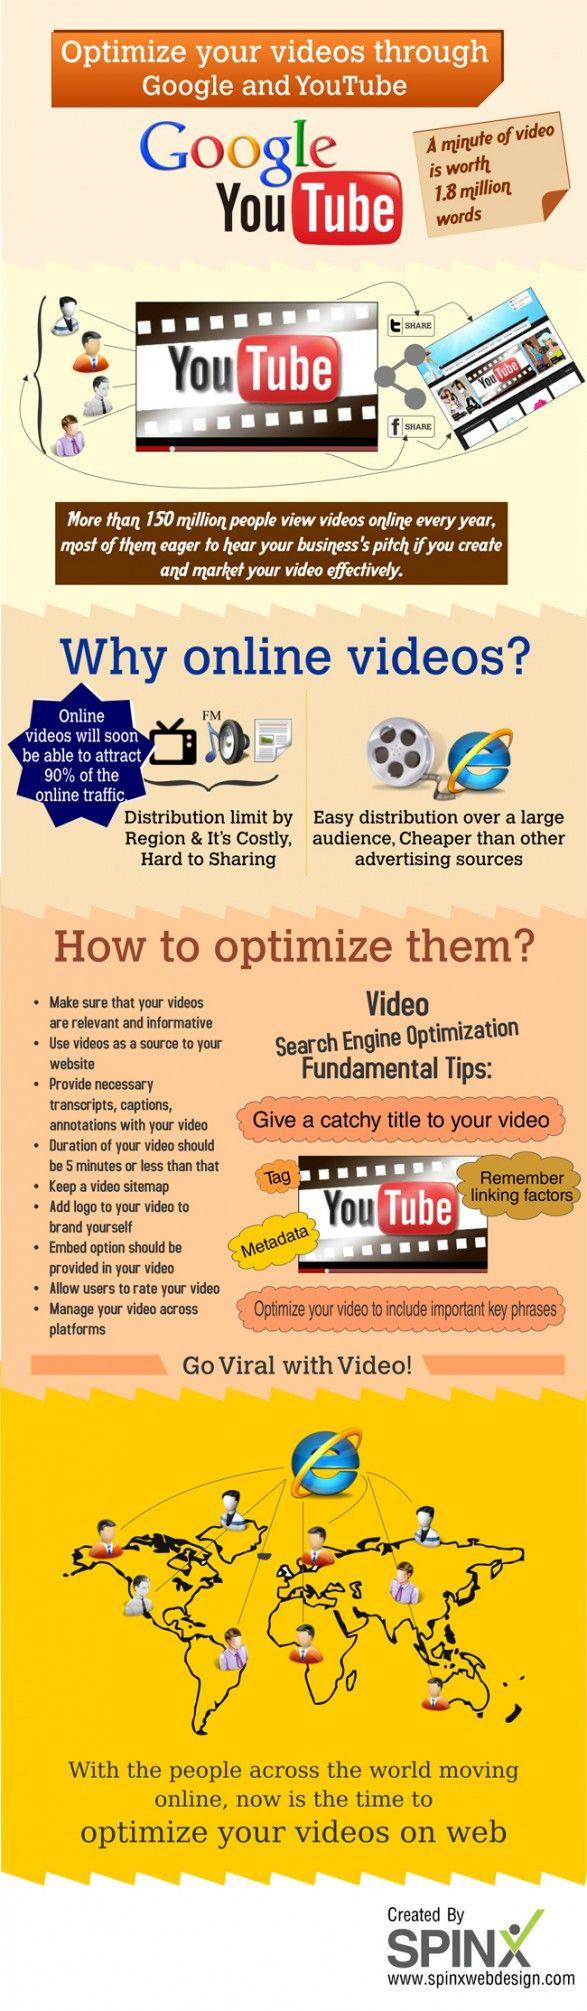 Online Video Marketing through Google and YouTube #videomarketing #blogging #makemoney